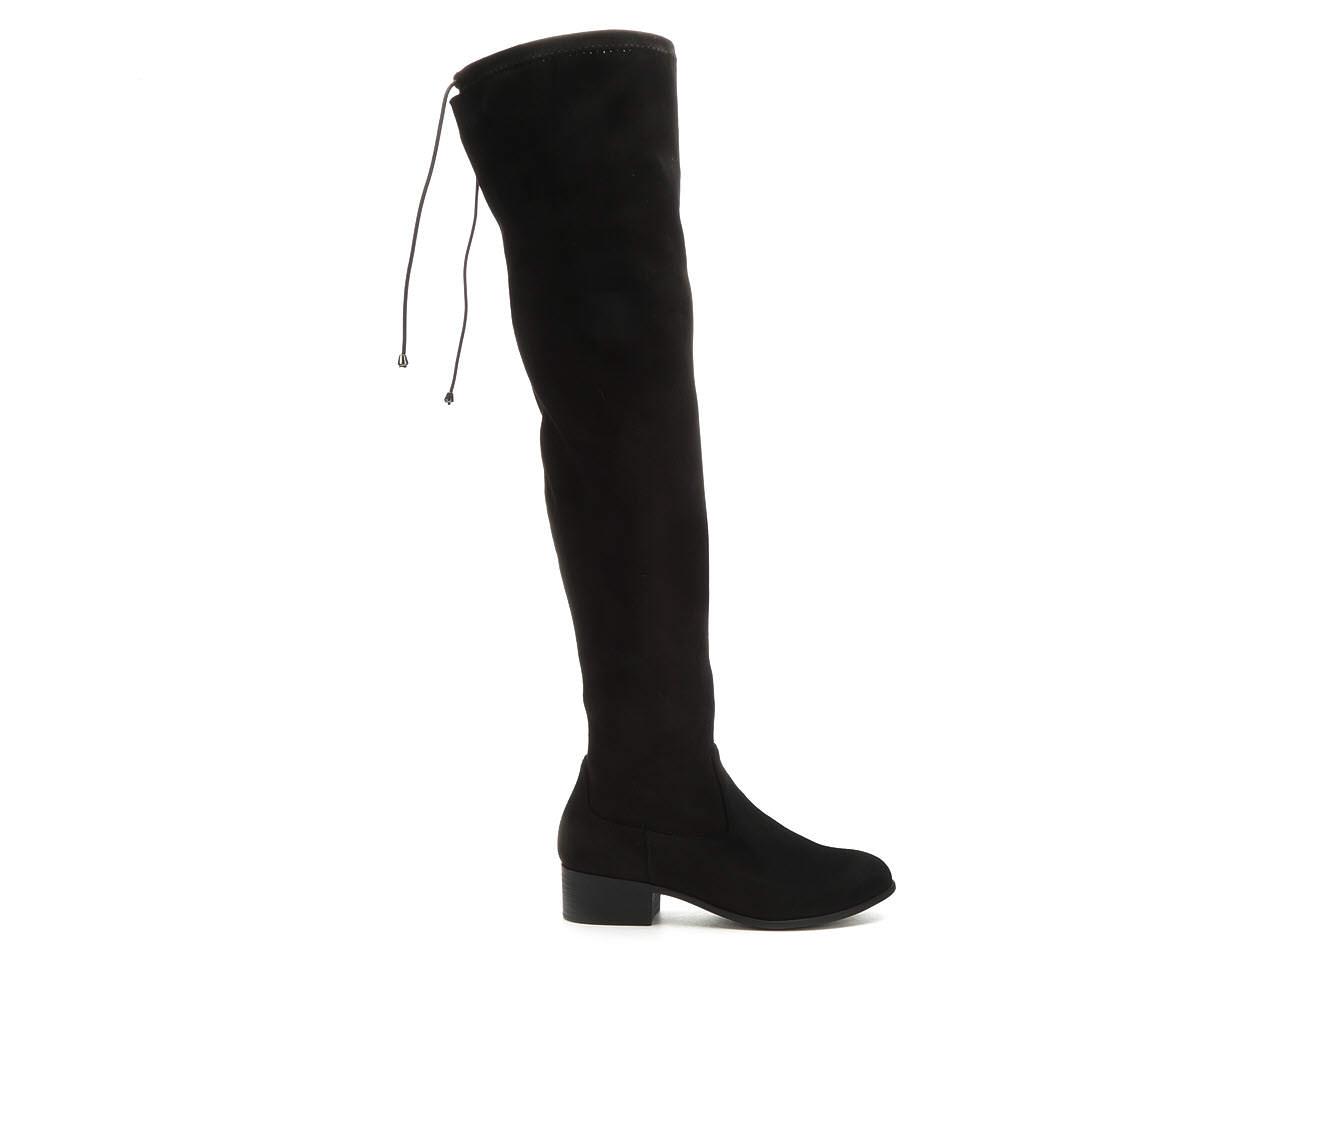 Y-Not Yah Women's Boot (Black Canvas)